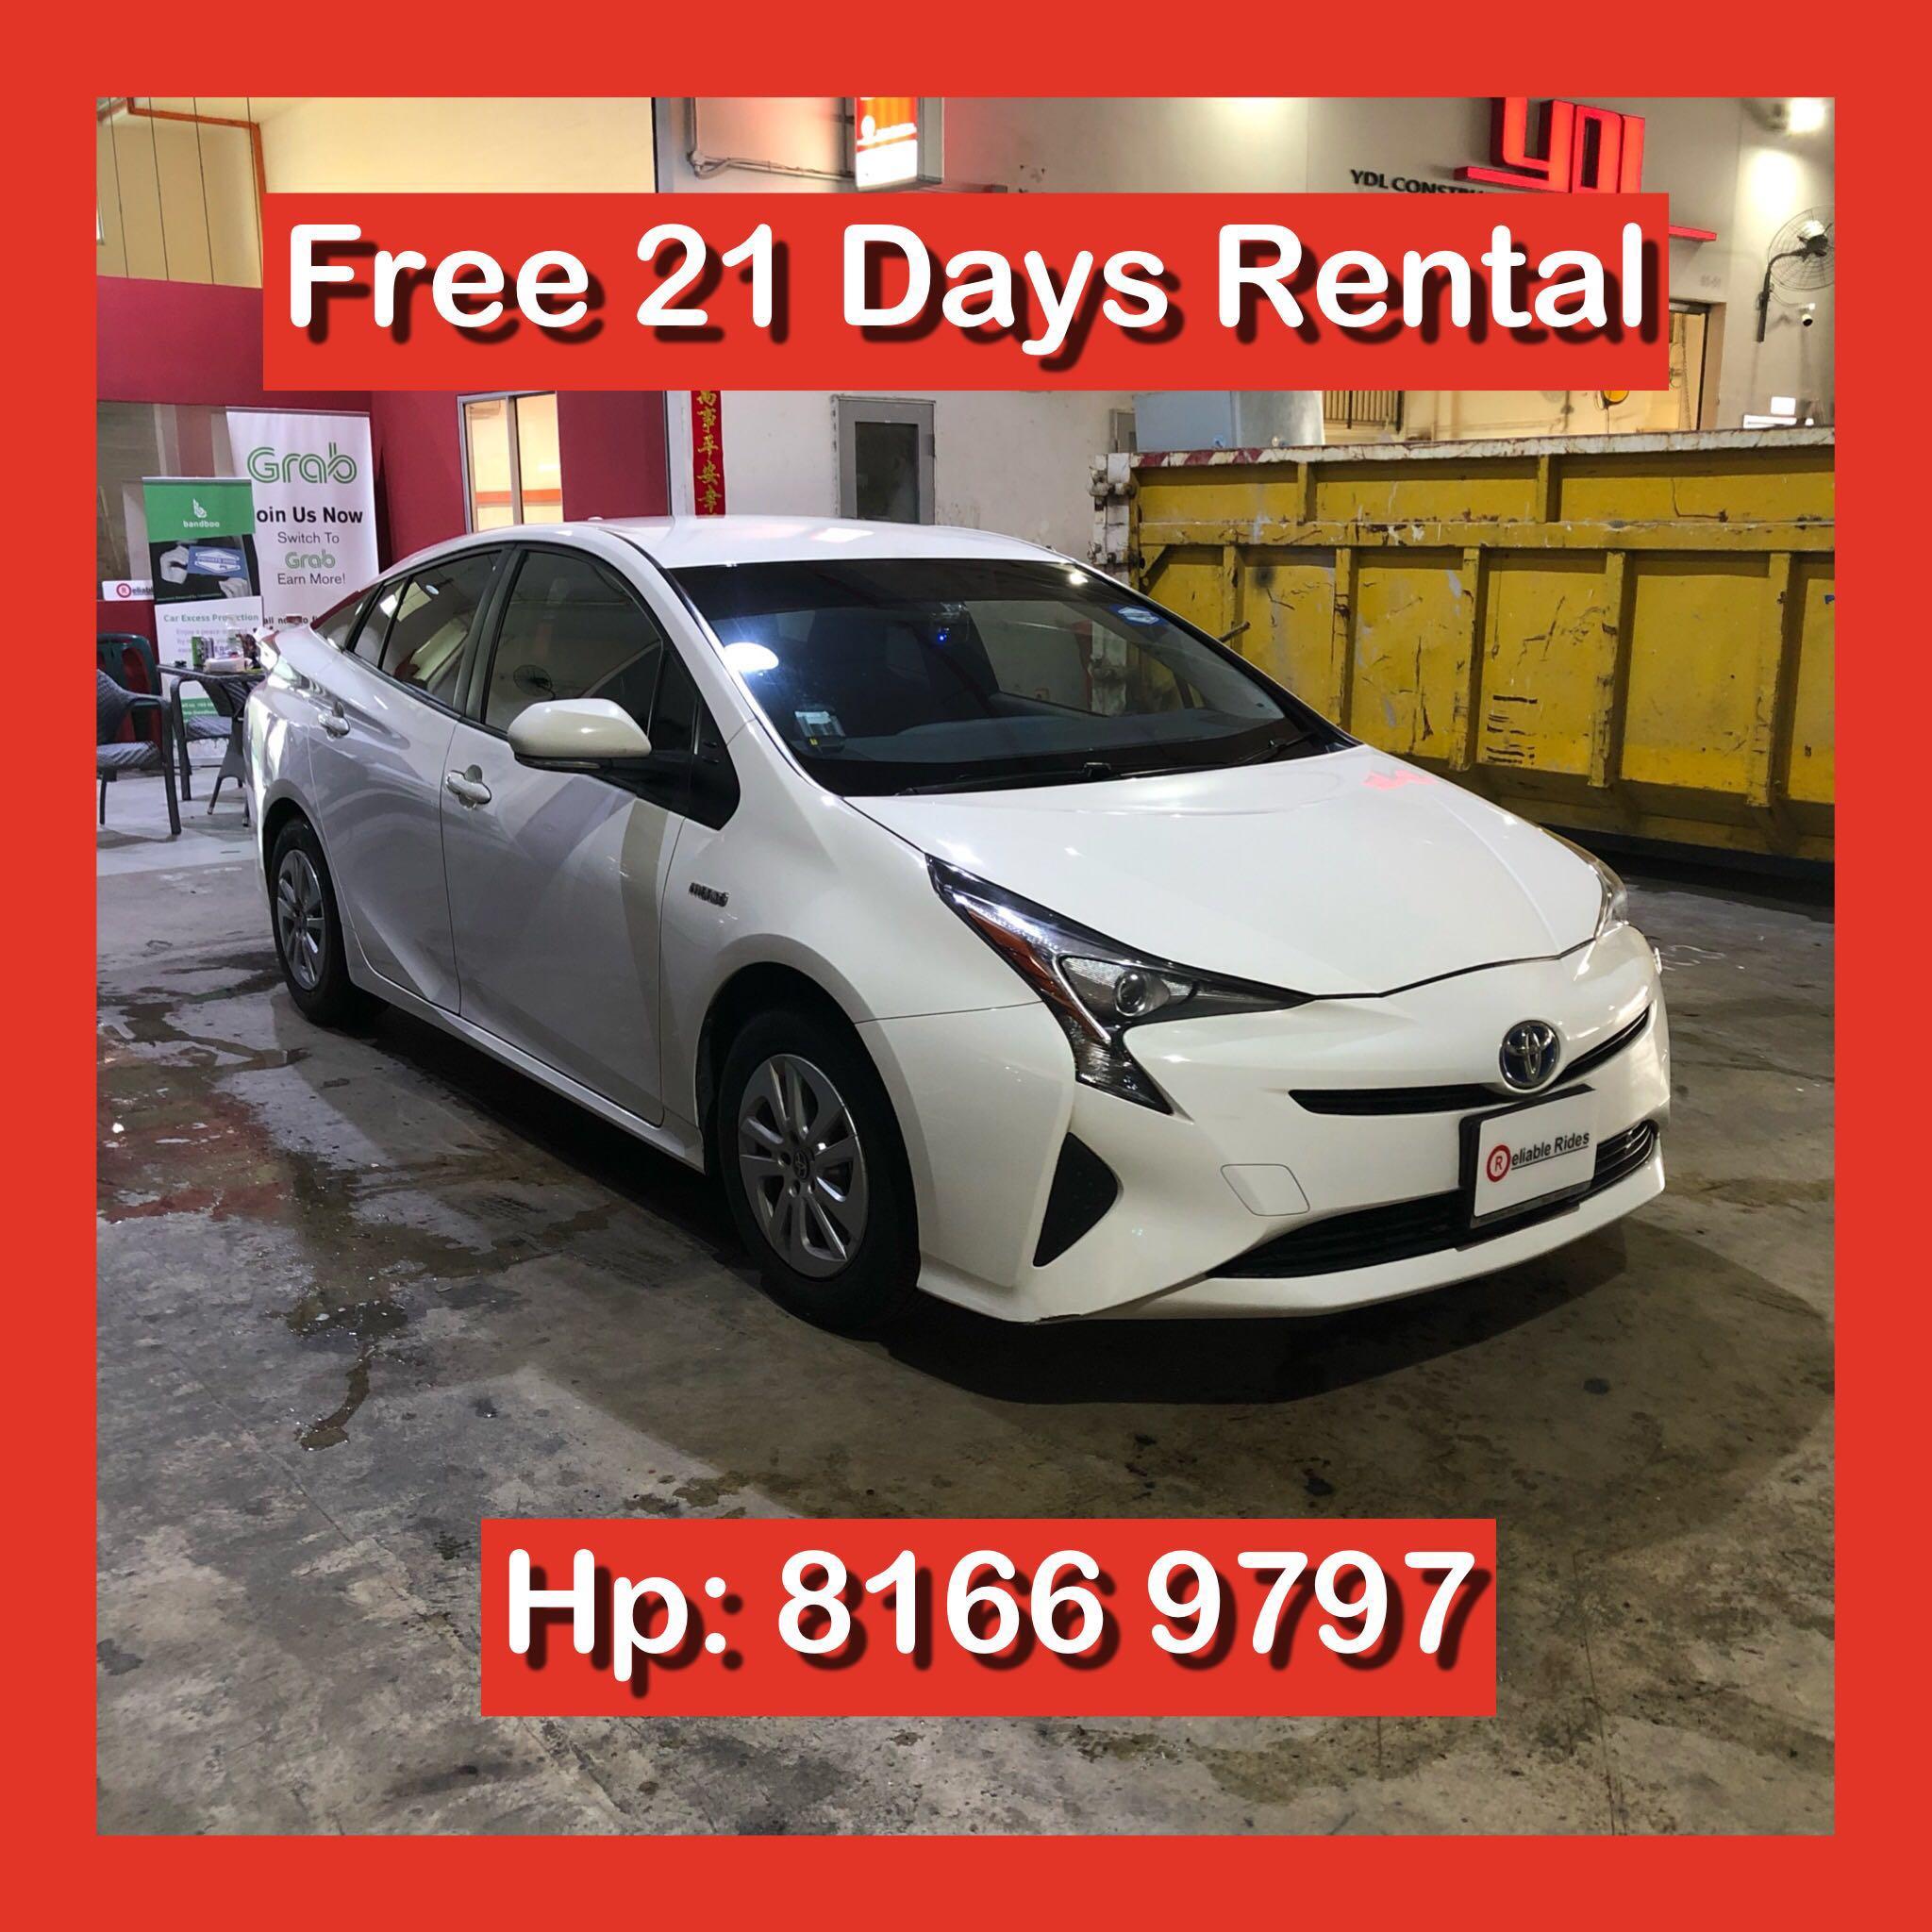 Toyota Prius 1 8 Auto Hybrid Grab Car Rental Cars Vehicle Rentals